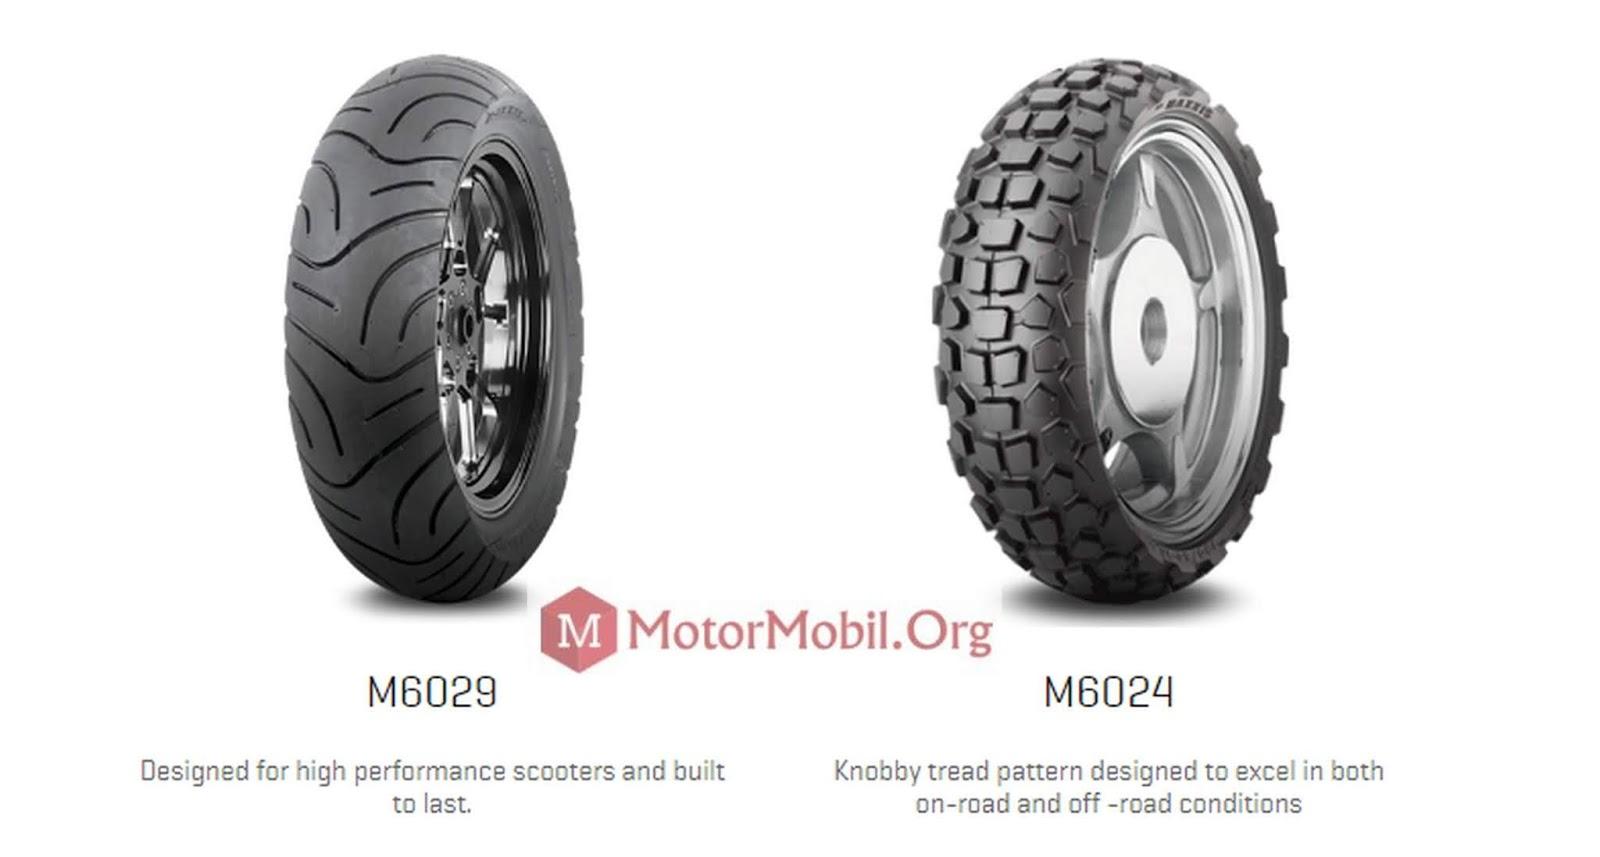 PROMO] Harga Ban Maxxis Mobil, SuperMoto & Sepeda MTB 2020